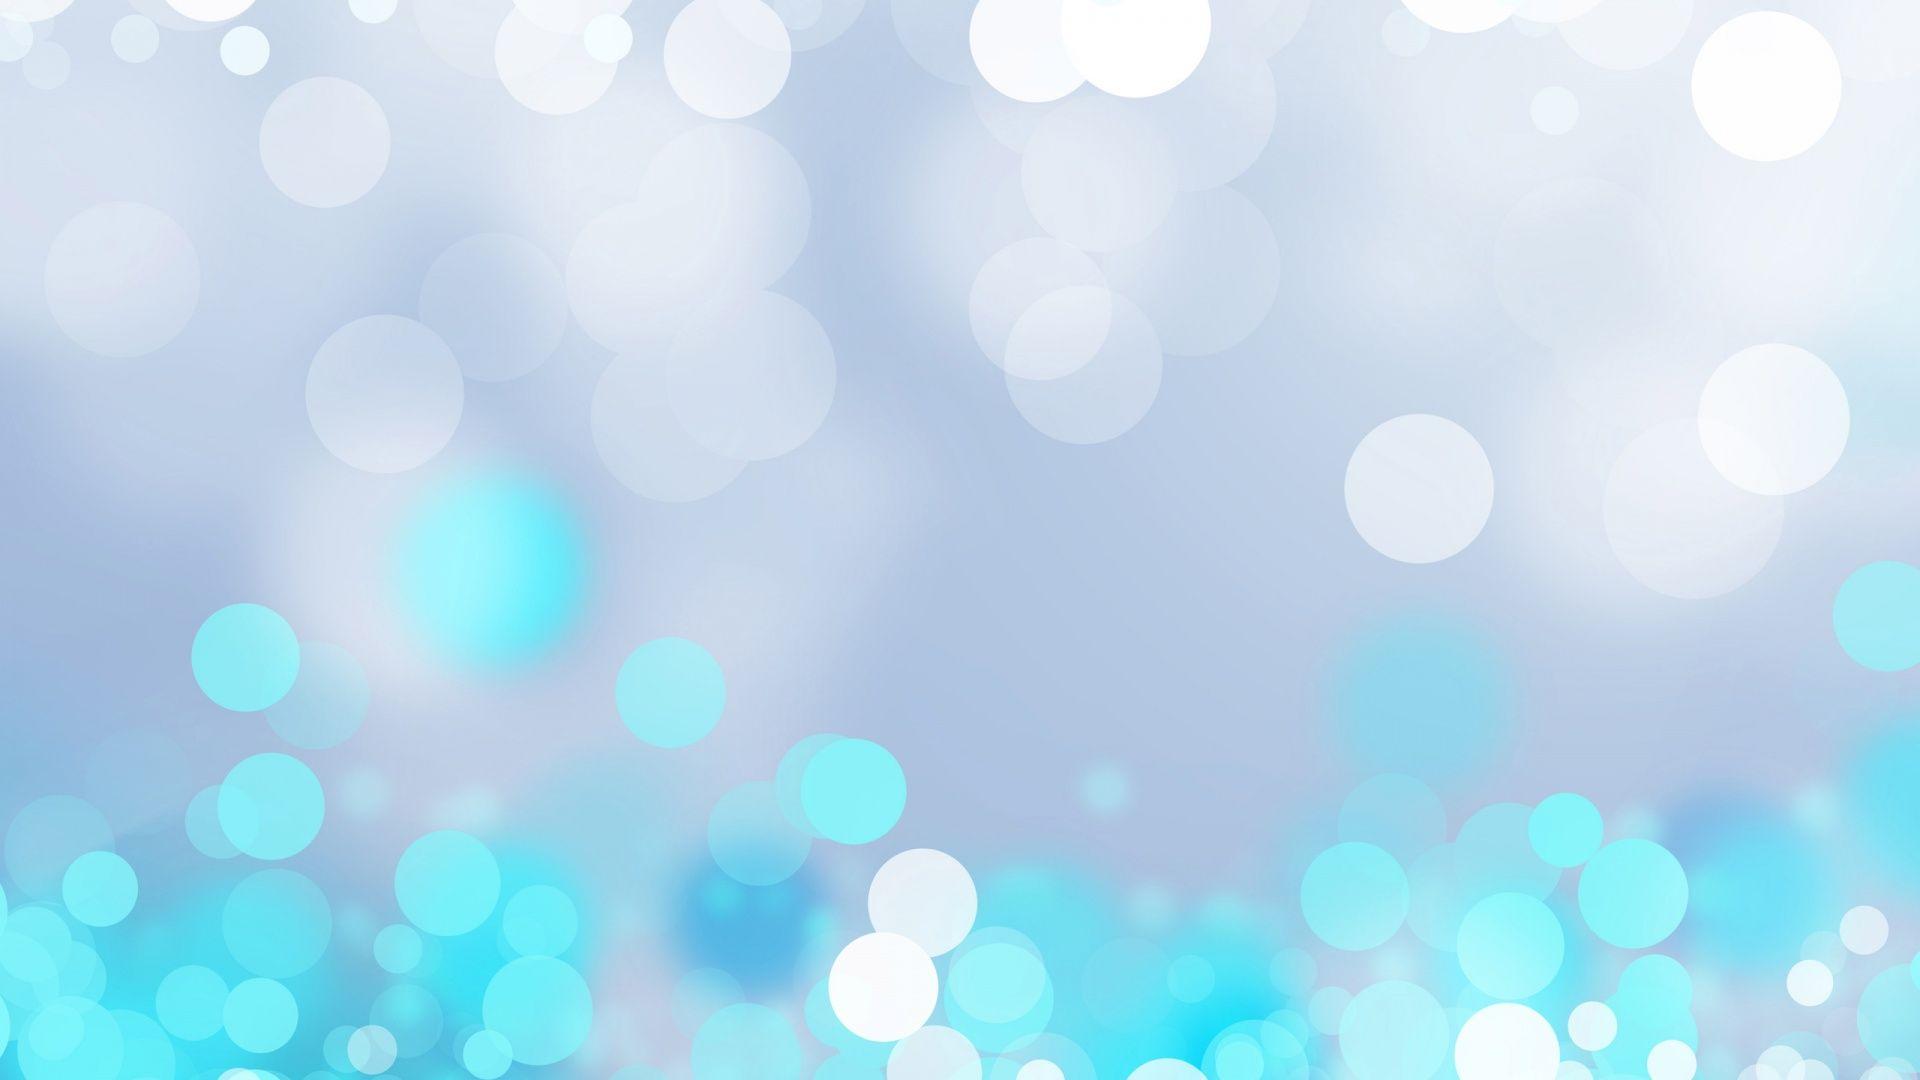 microsoft powerpoint free backgrounds - www. | FOOD: Appetizer ...